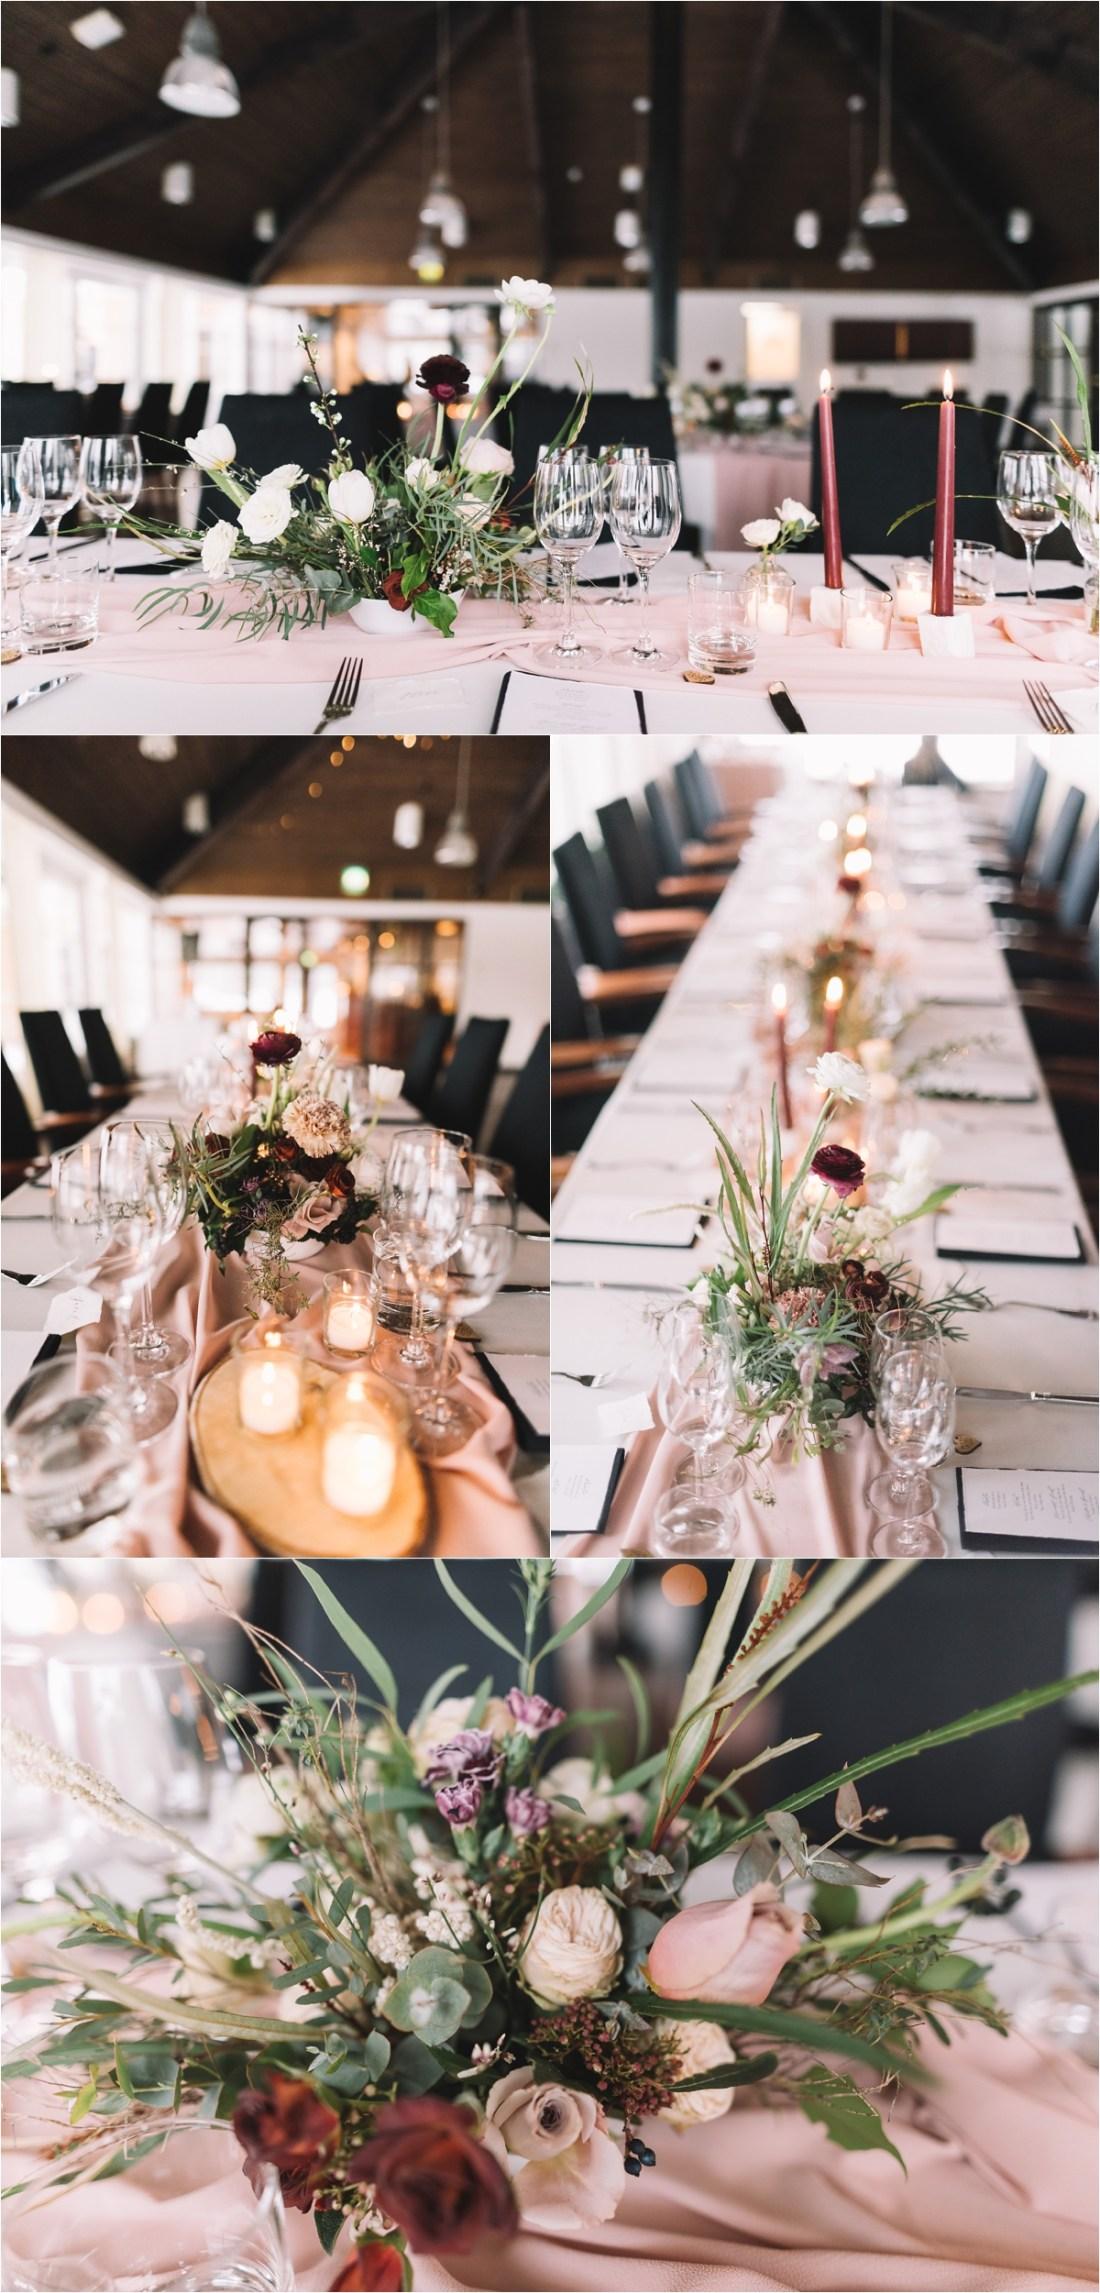 Winter wedding decor for a winter wonderland wedding in Finland by Lucie Watson Photography